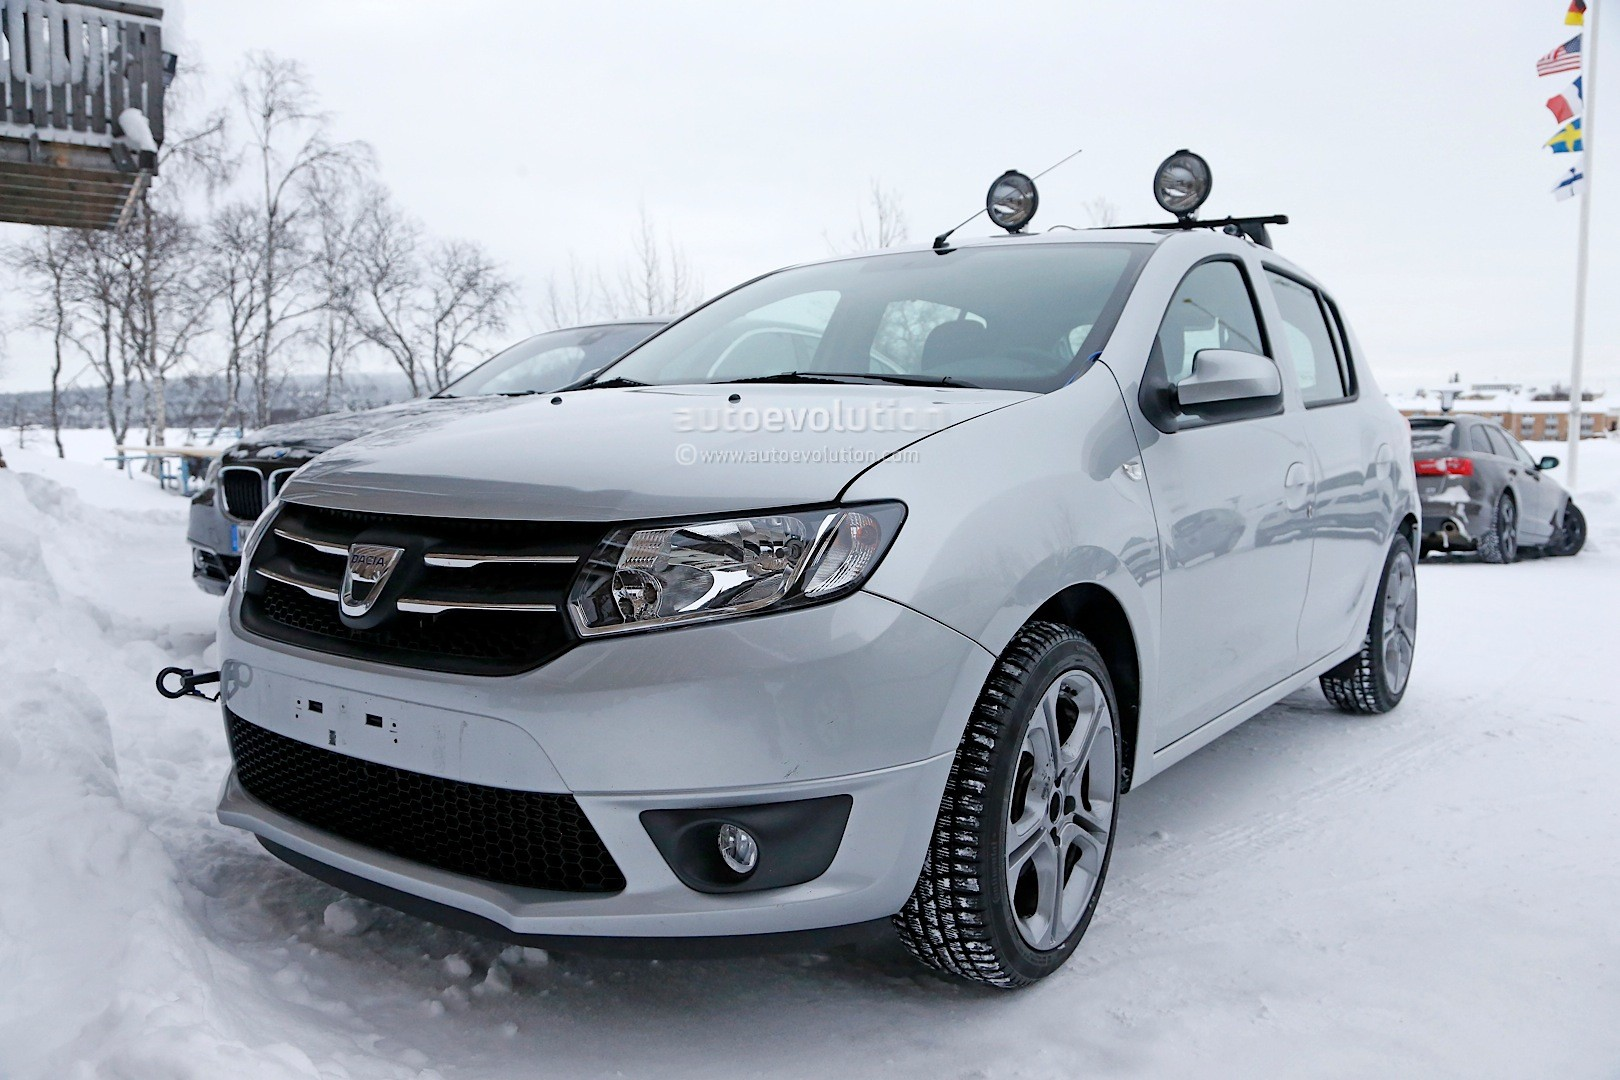 2012 - [Dacia] Sandero II - Page 14 Spyshots-dacia-sandero-rs-getting-12-turbo-engine-sportier-interior_1